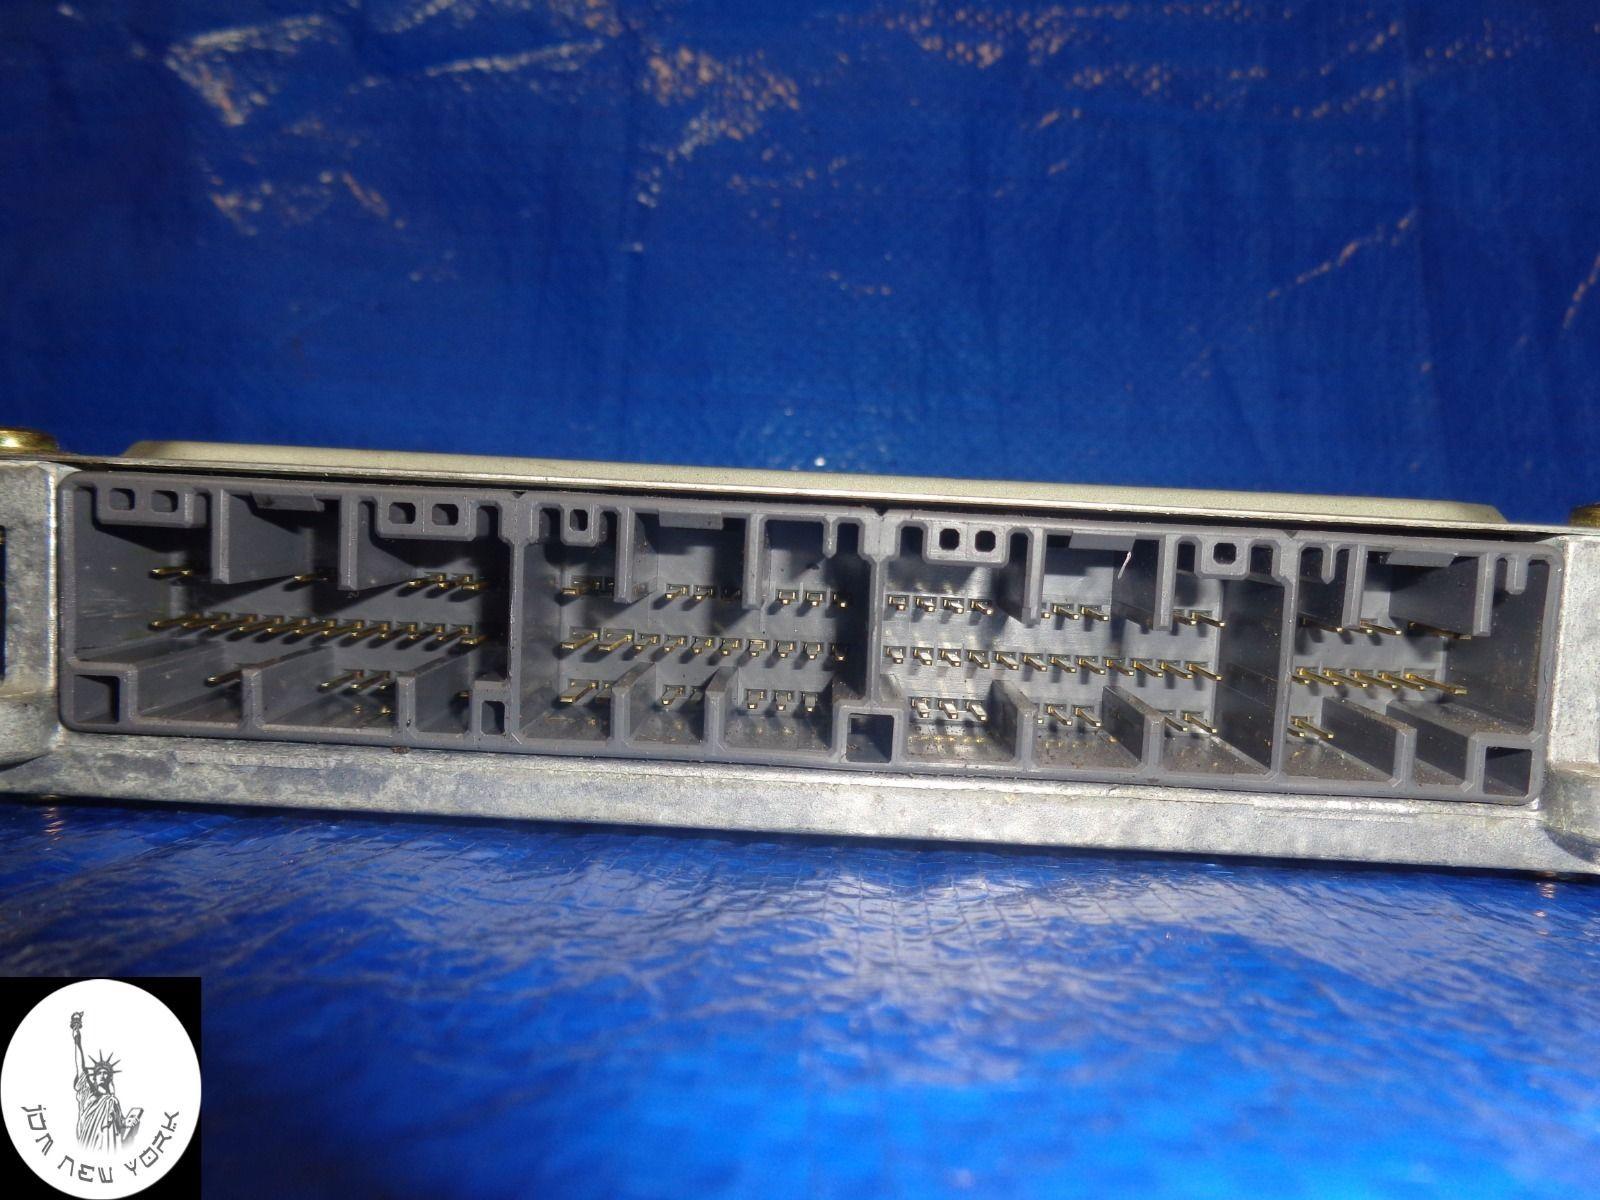 HONDA CIVIC ECUENGINE CONTROL UNIT PJJ JDM DB JDM - P2j ecu wiring diagram